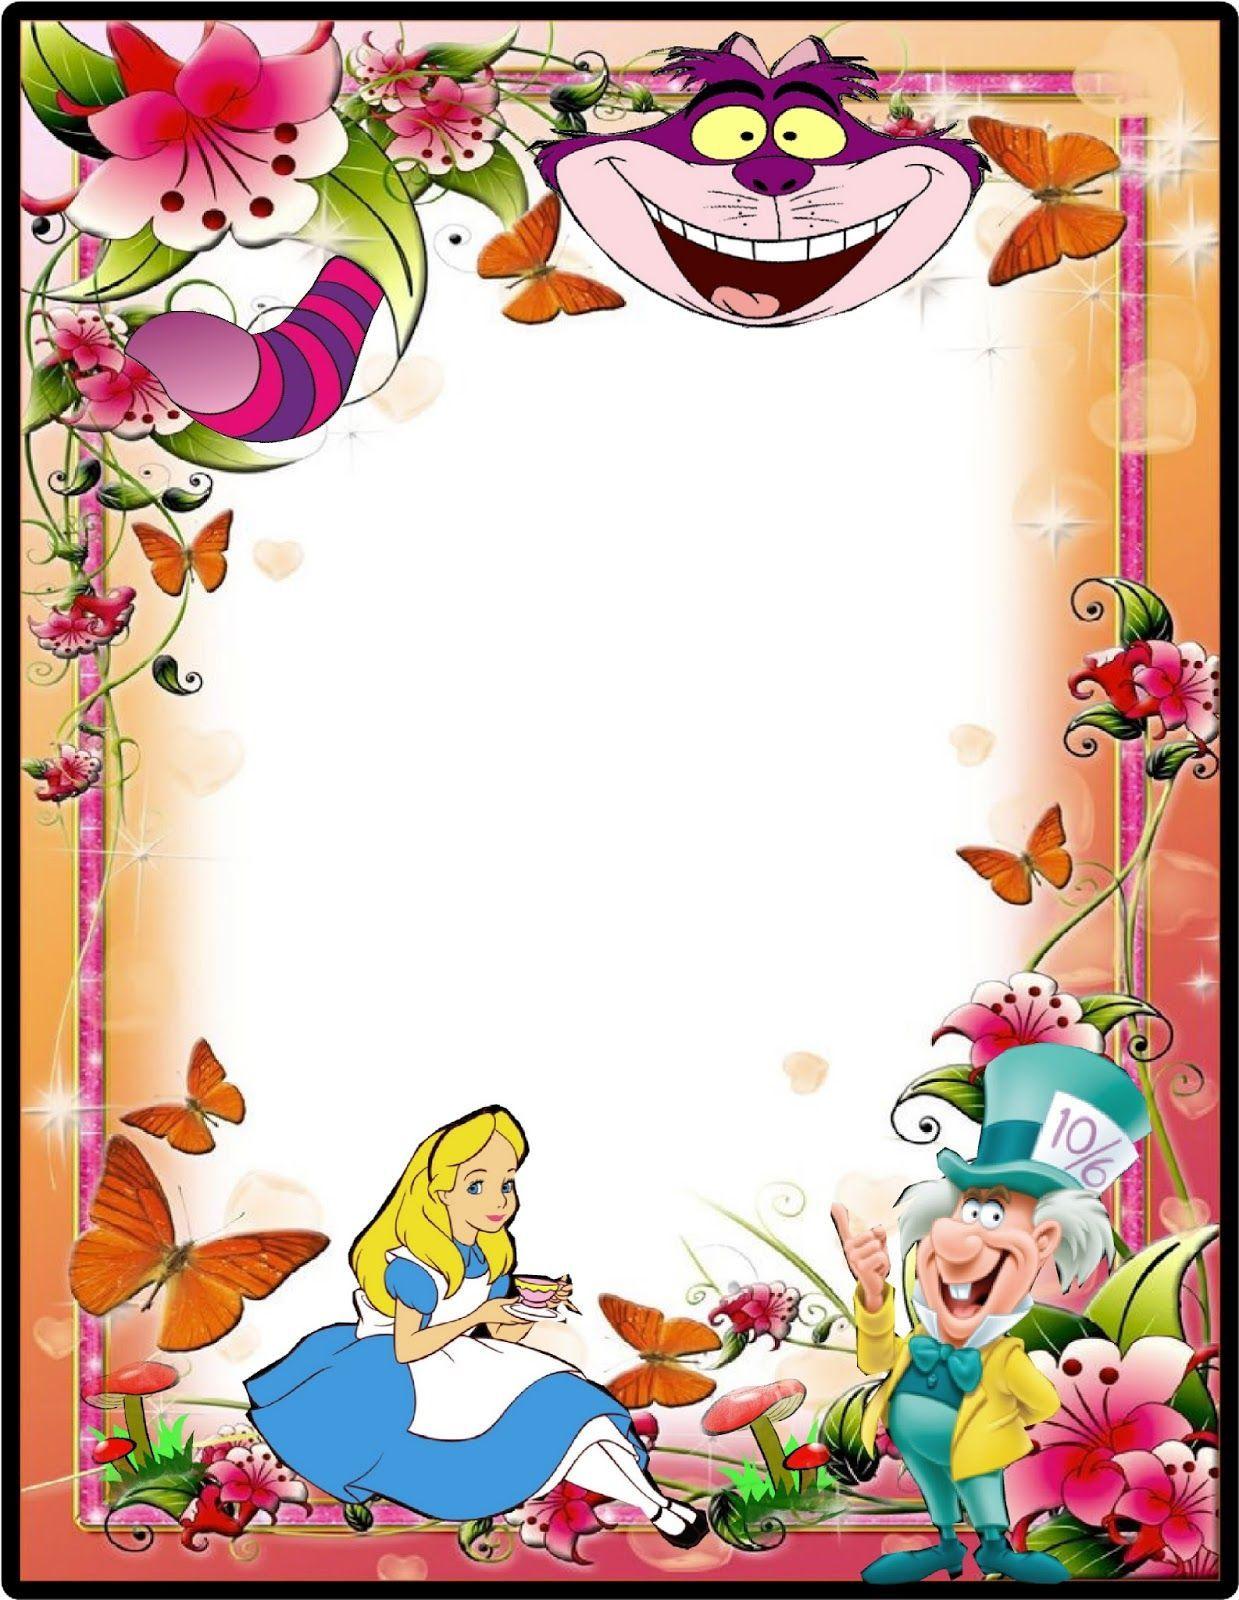 001 Staggering Alice In Wonderland Party Template Idea  Templates Invitation FreeFull